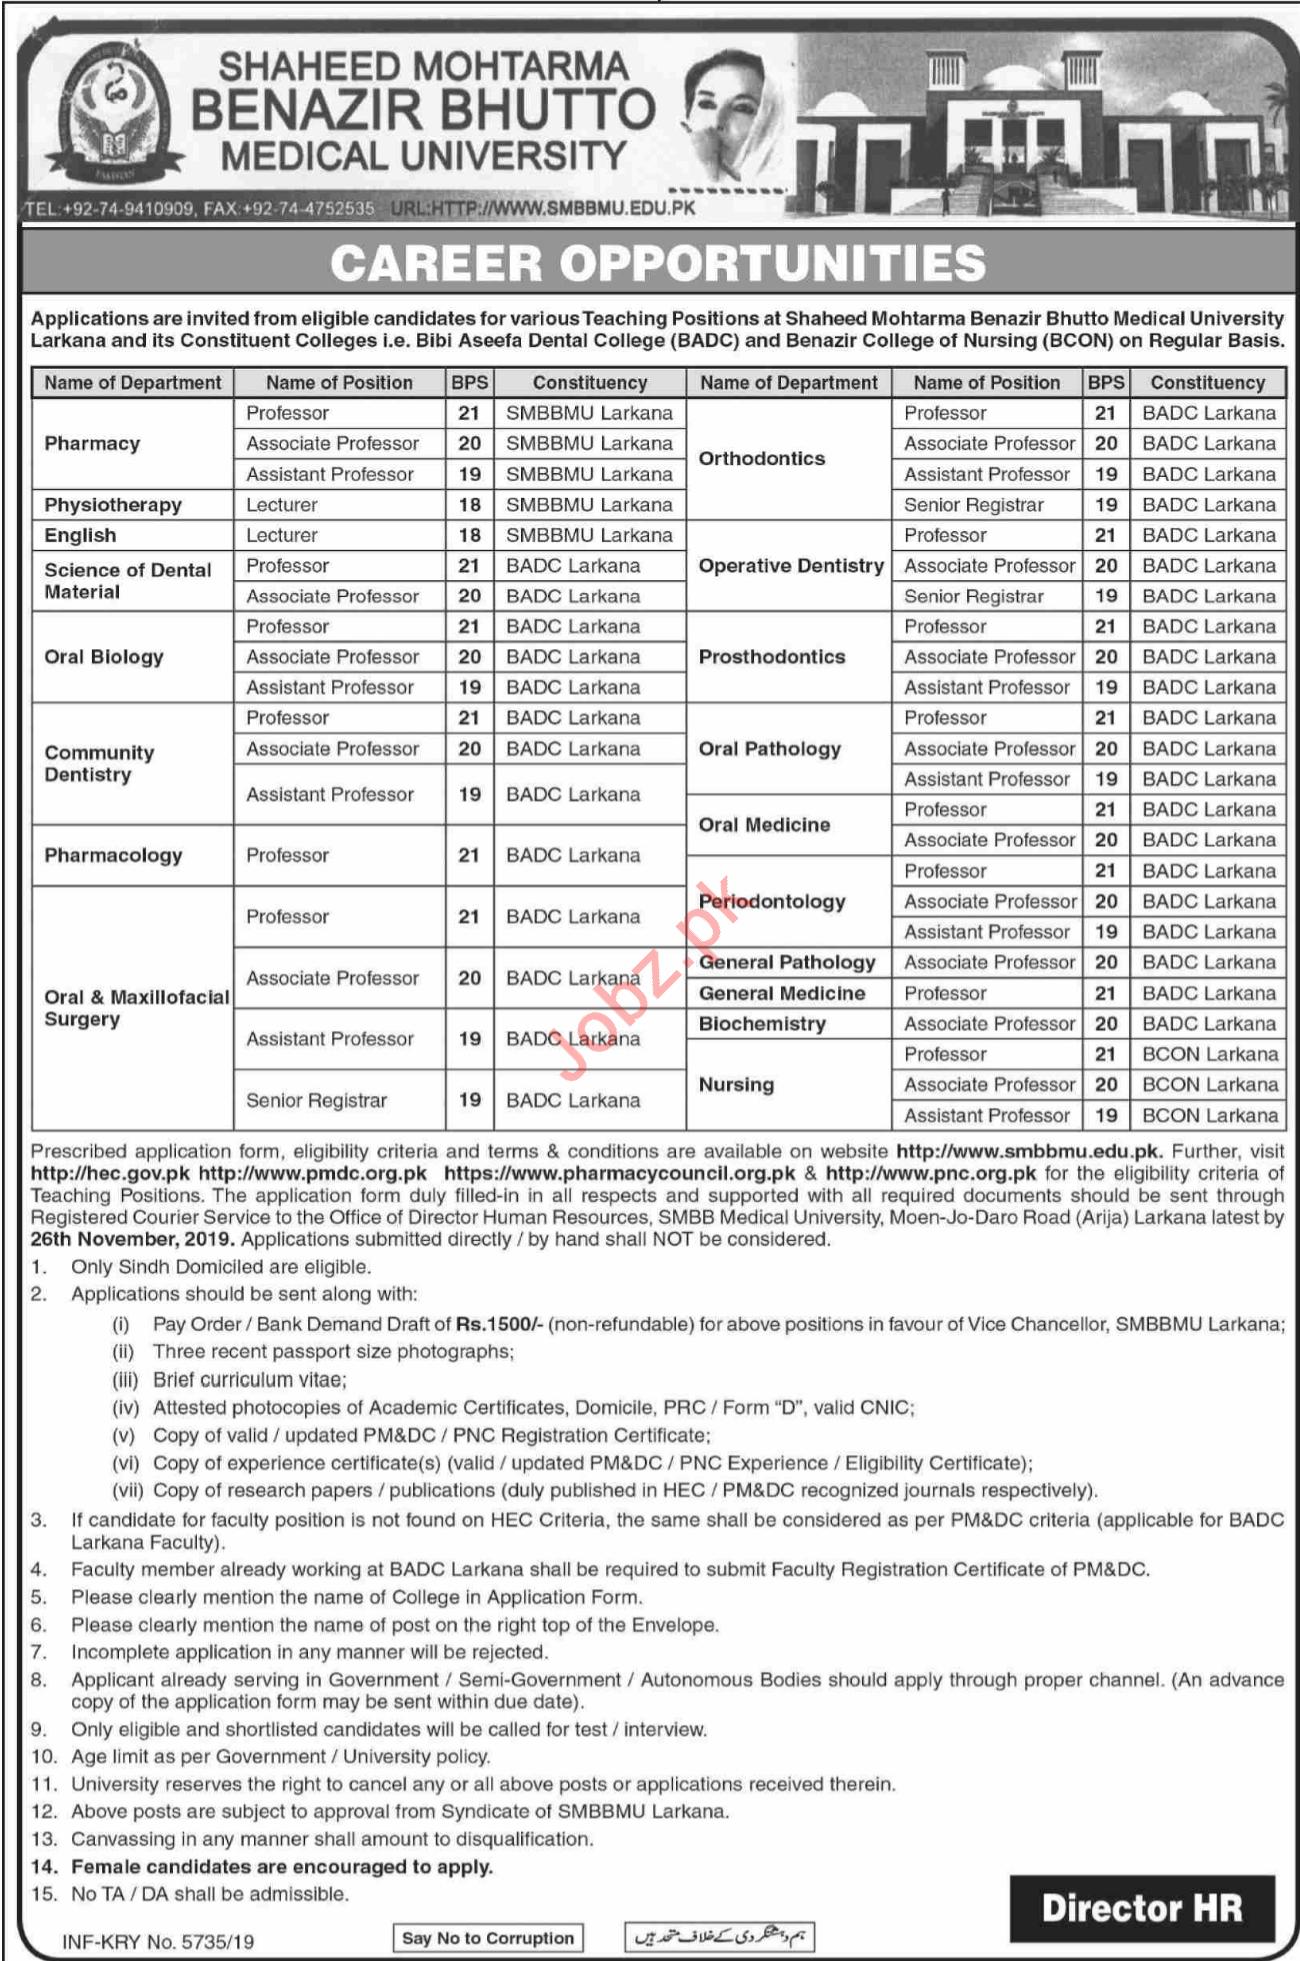 Shaheed Mohtarma Benazir Bhutto Medical University Jobs